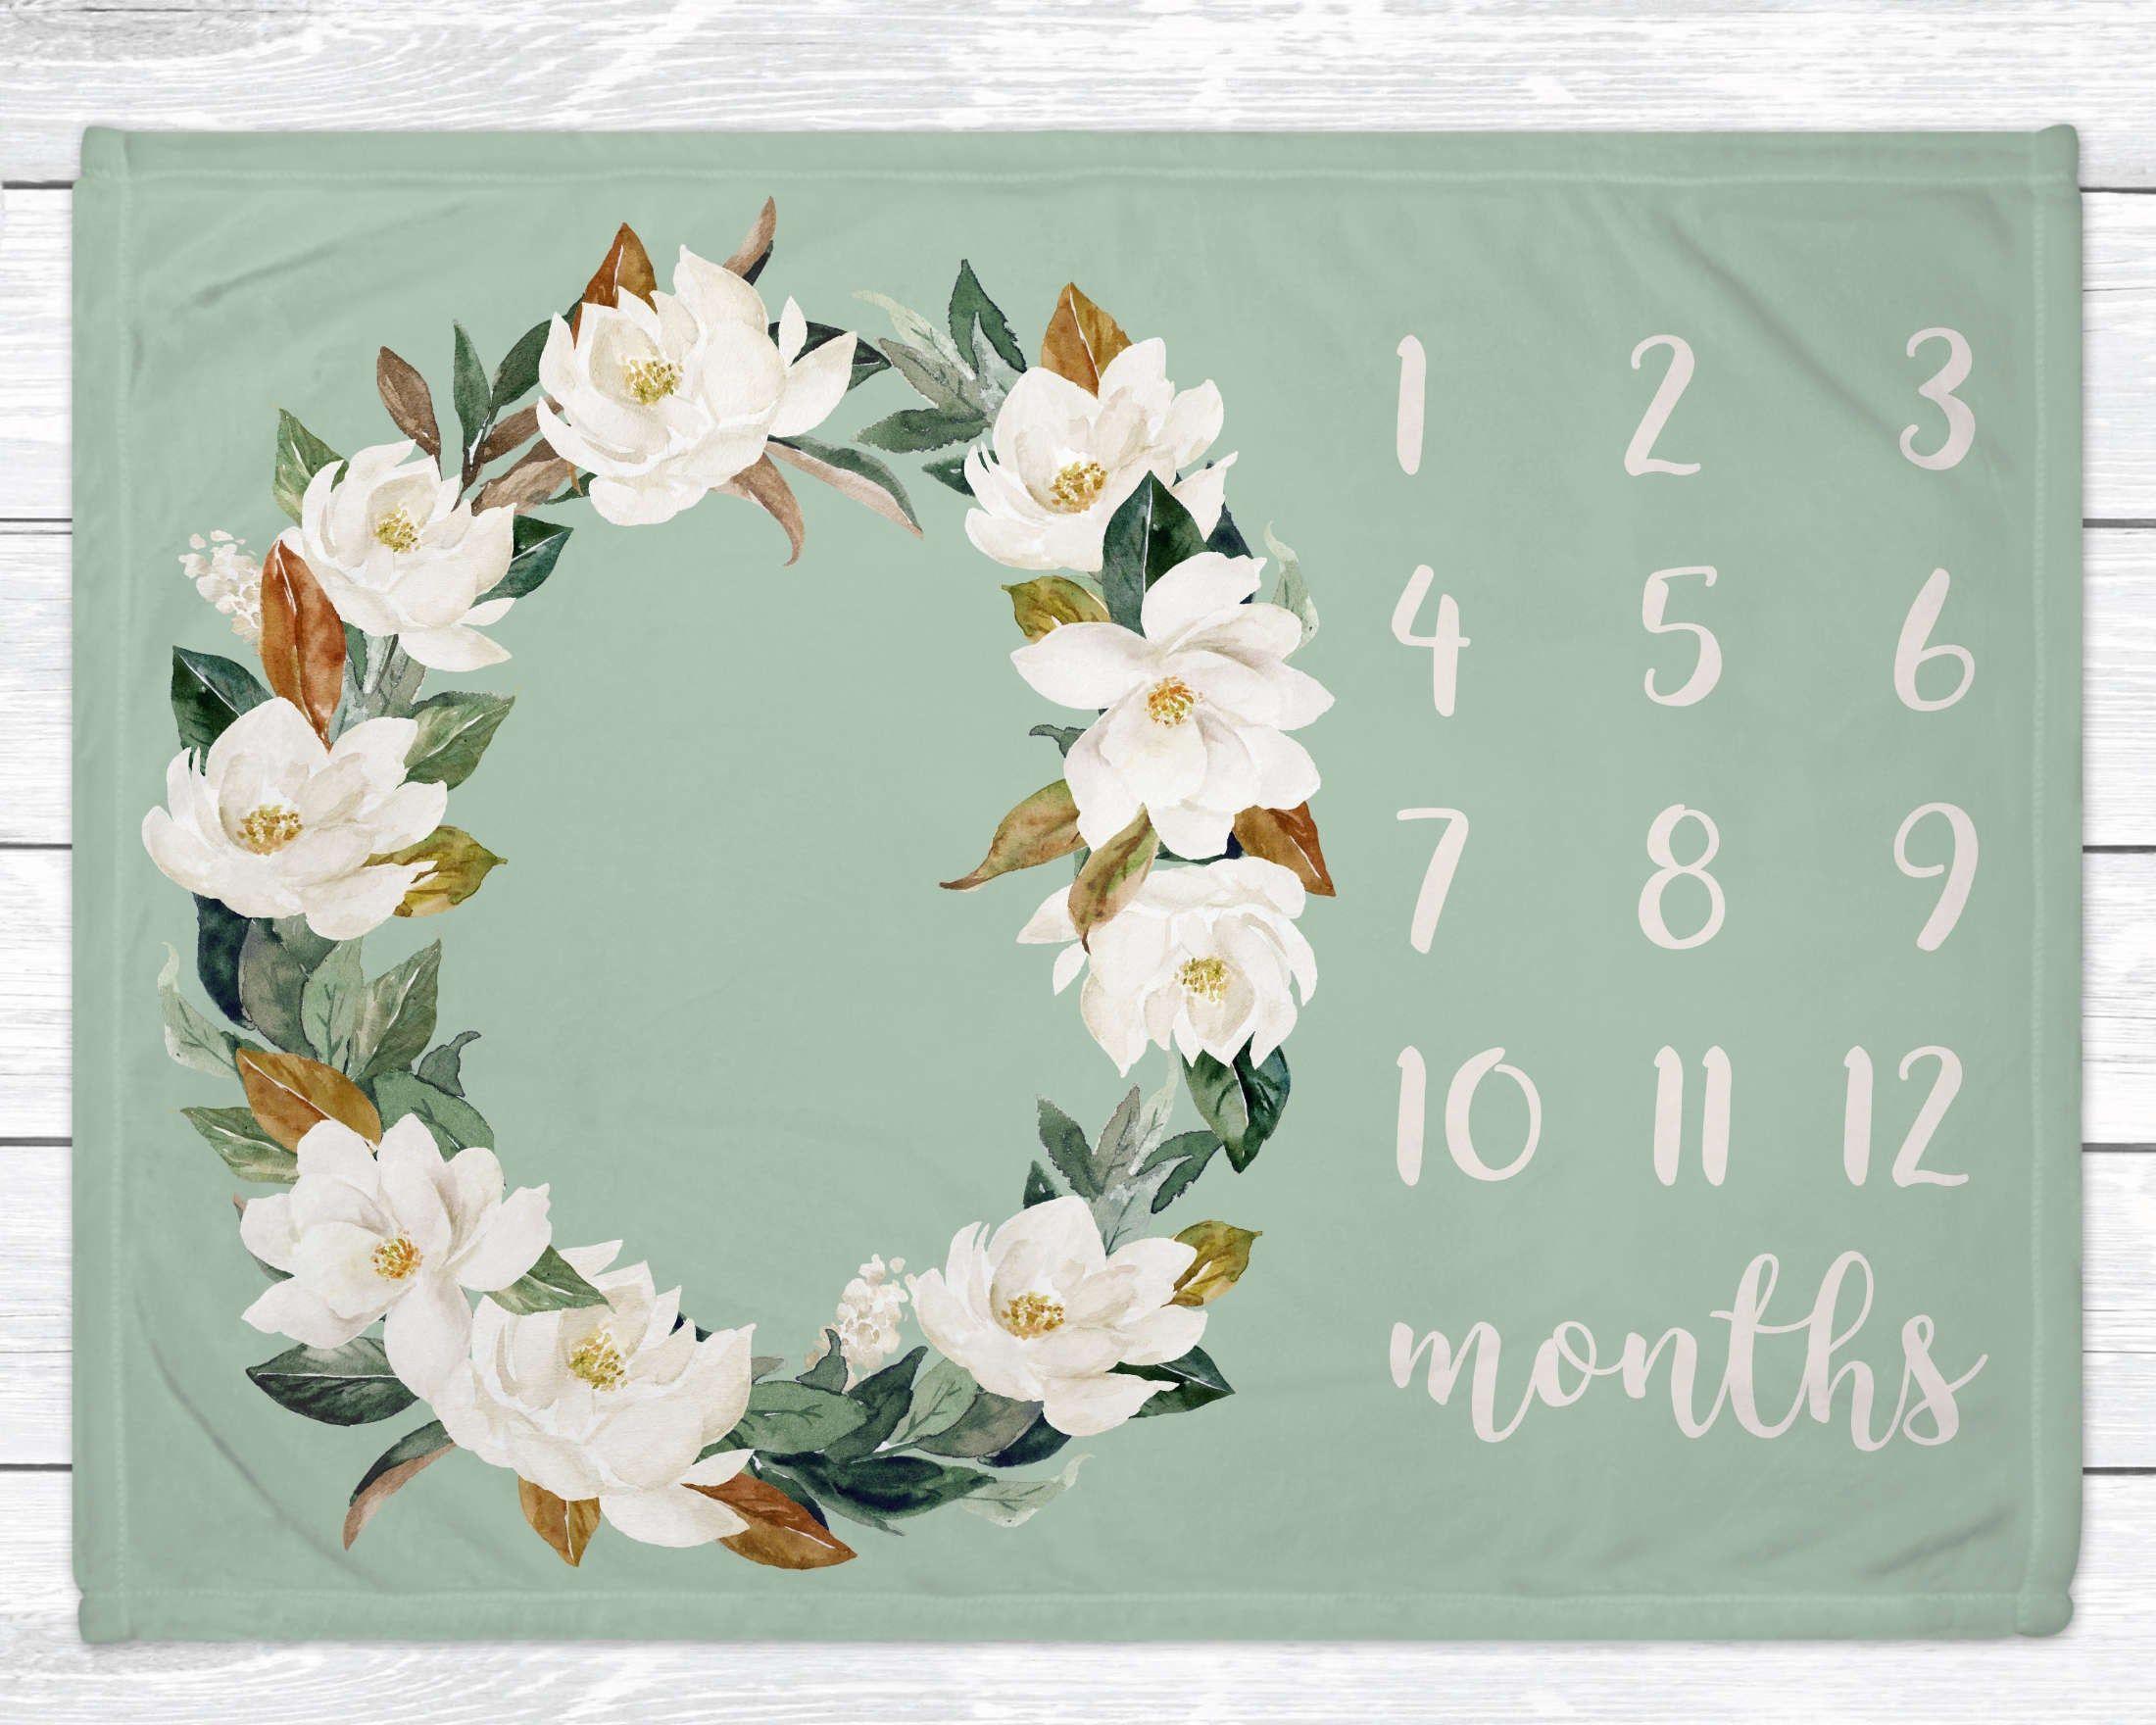 Monthly Baby Milestone Blanket Milestone Blanket Girl Etsy In 2020 Milestone Blanket Baby Milestone Blanket Gender Neutral Baby Blanket